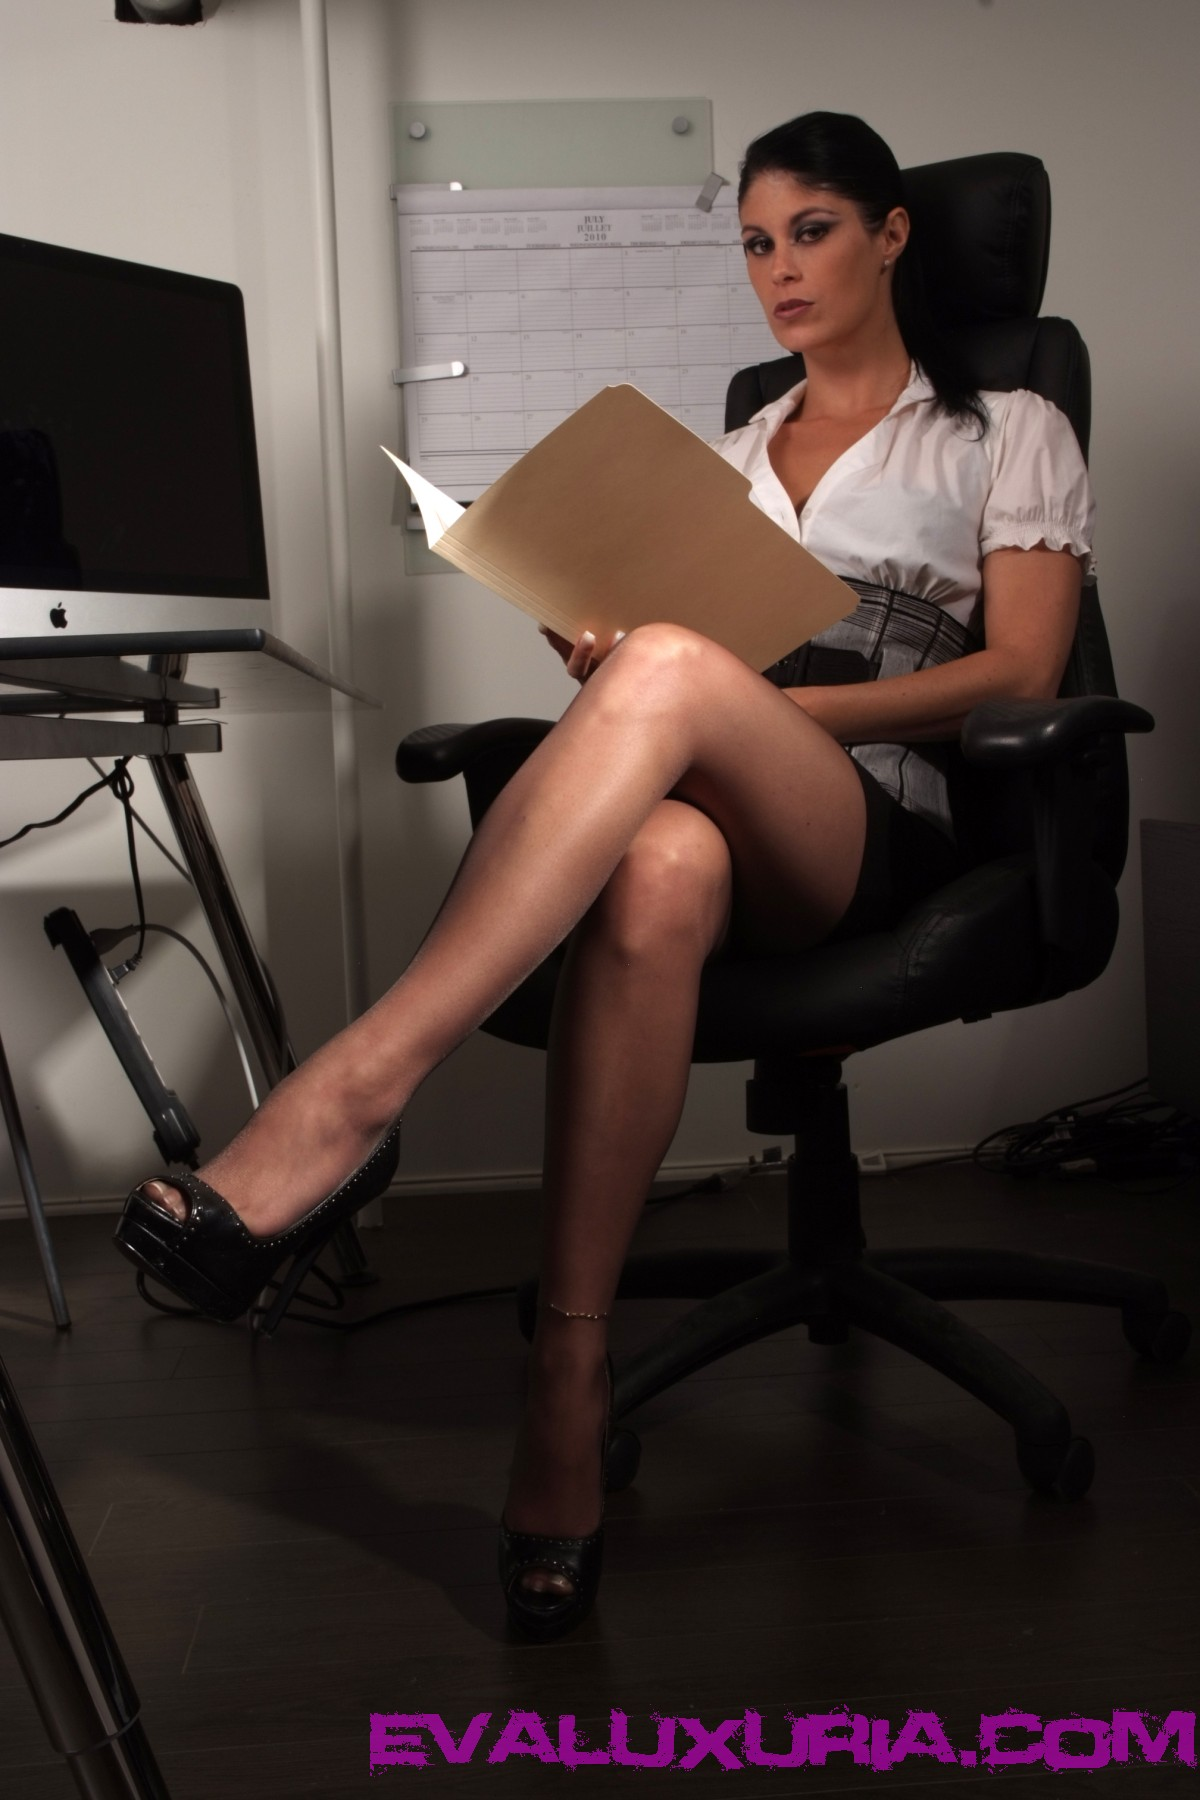 Сочная секретарша и ее киска фото 1 фотография